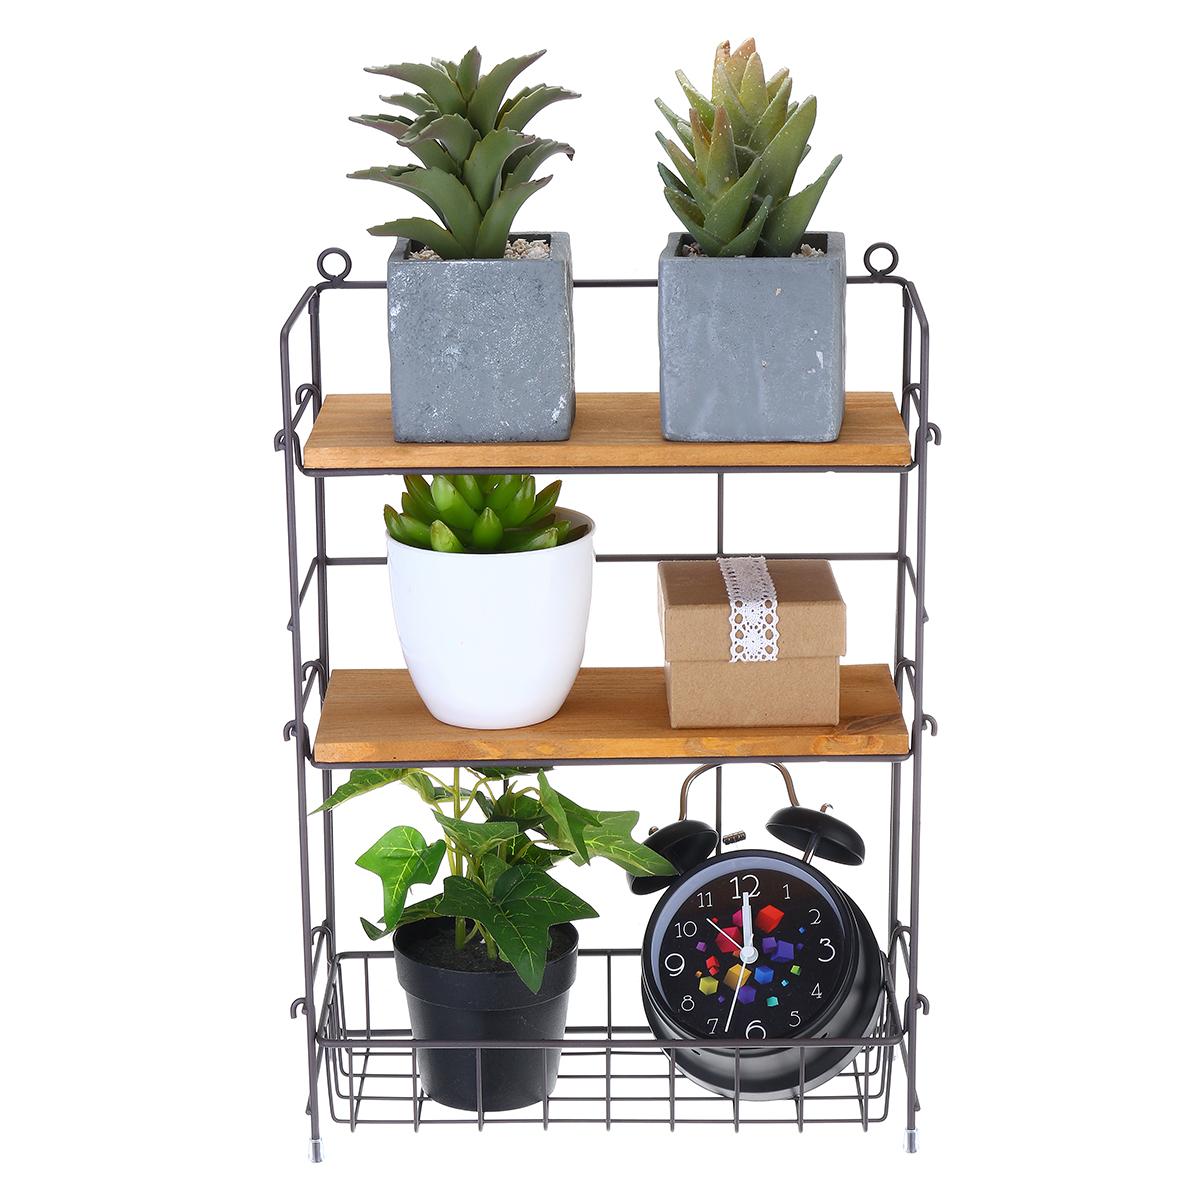 Storage Rack Iron Art Wood Shelf Floor-mounted Organizer Multi-purpose Container Home Bathroom Kitchen Sundries Organizers